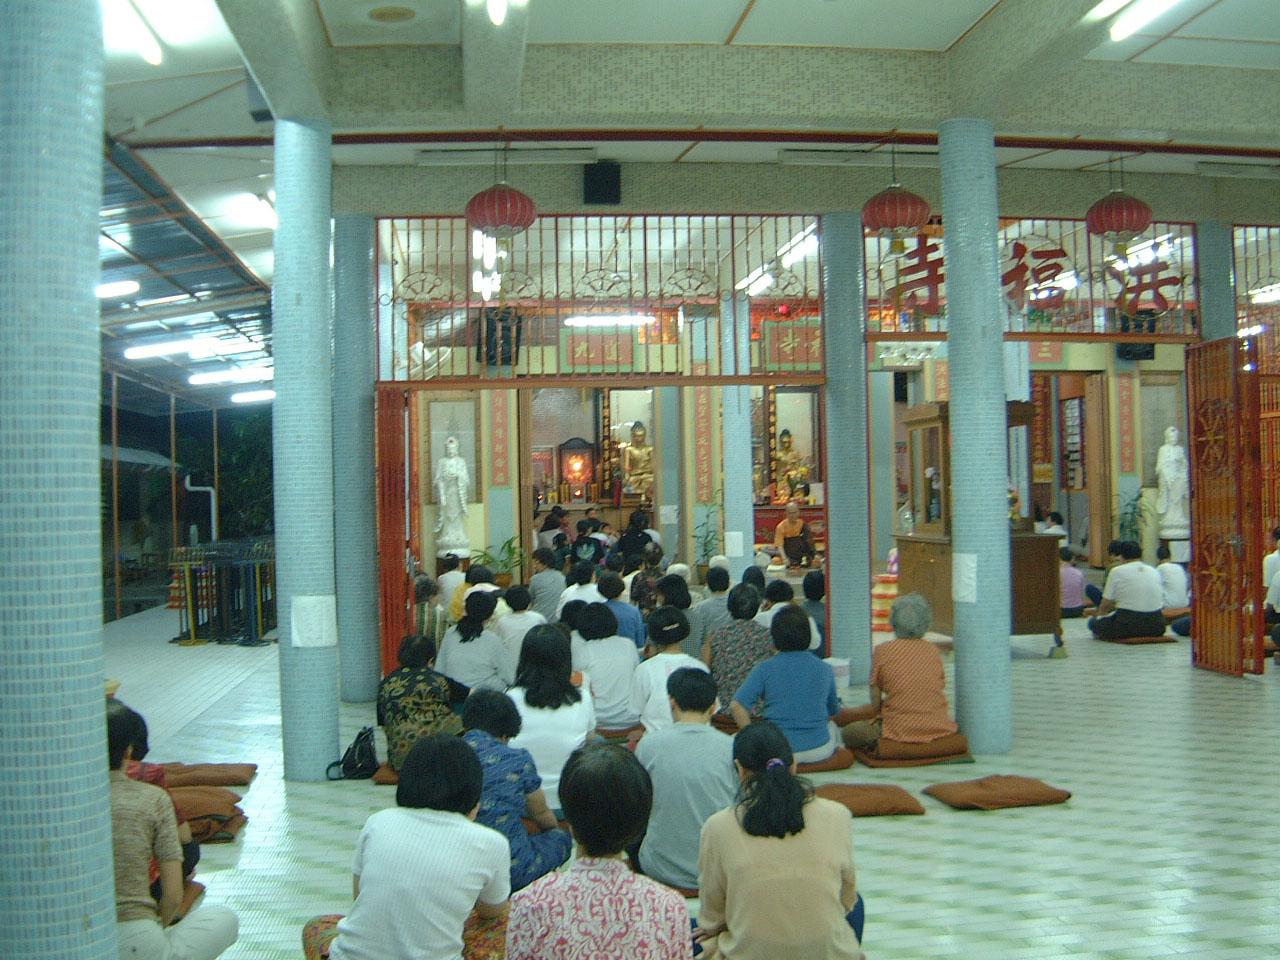 Penang Chinese Monastery Head Monk dharma talk 2001 03